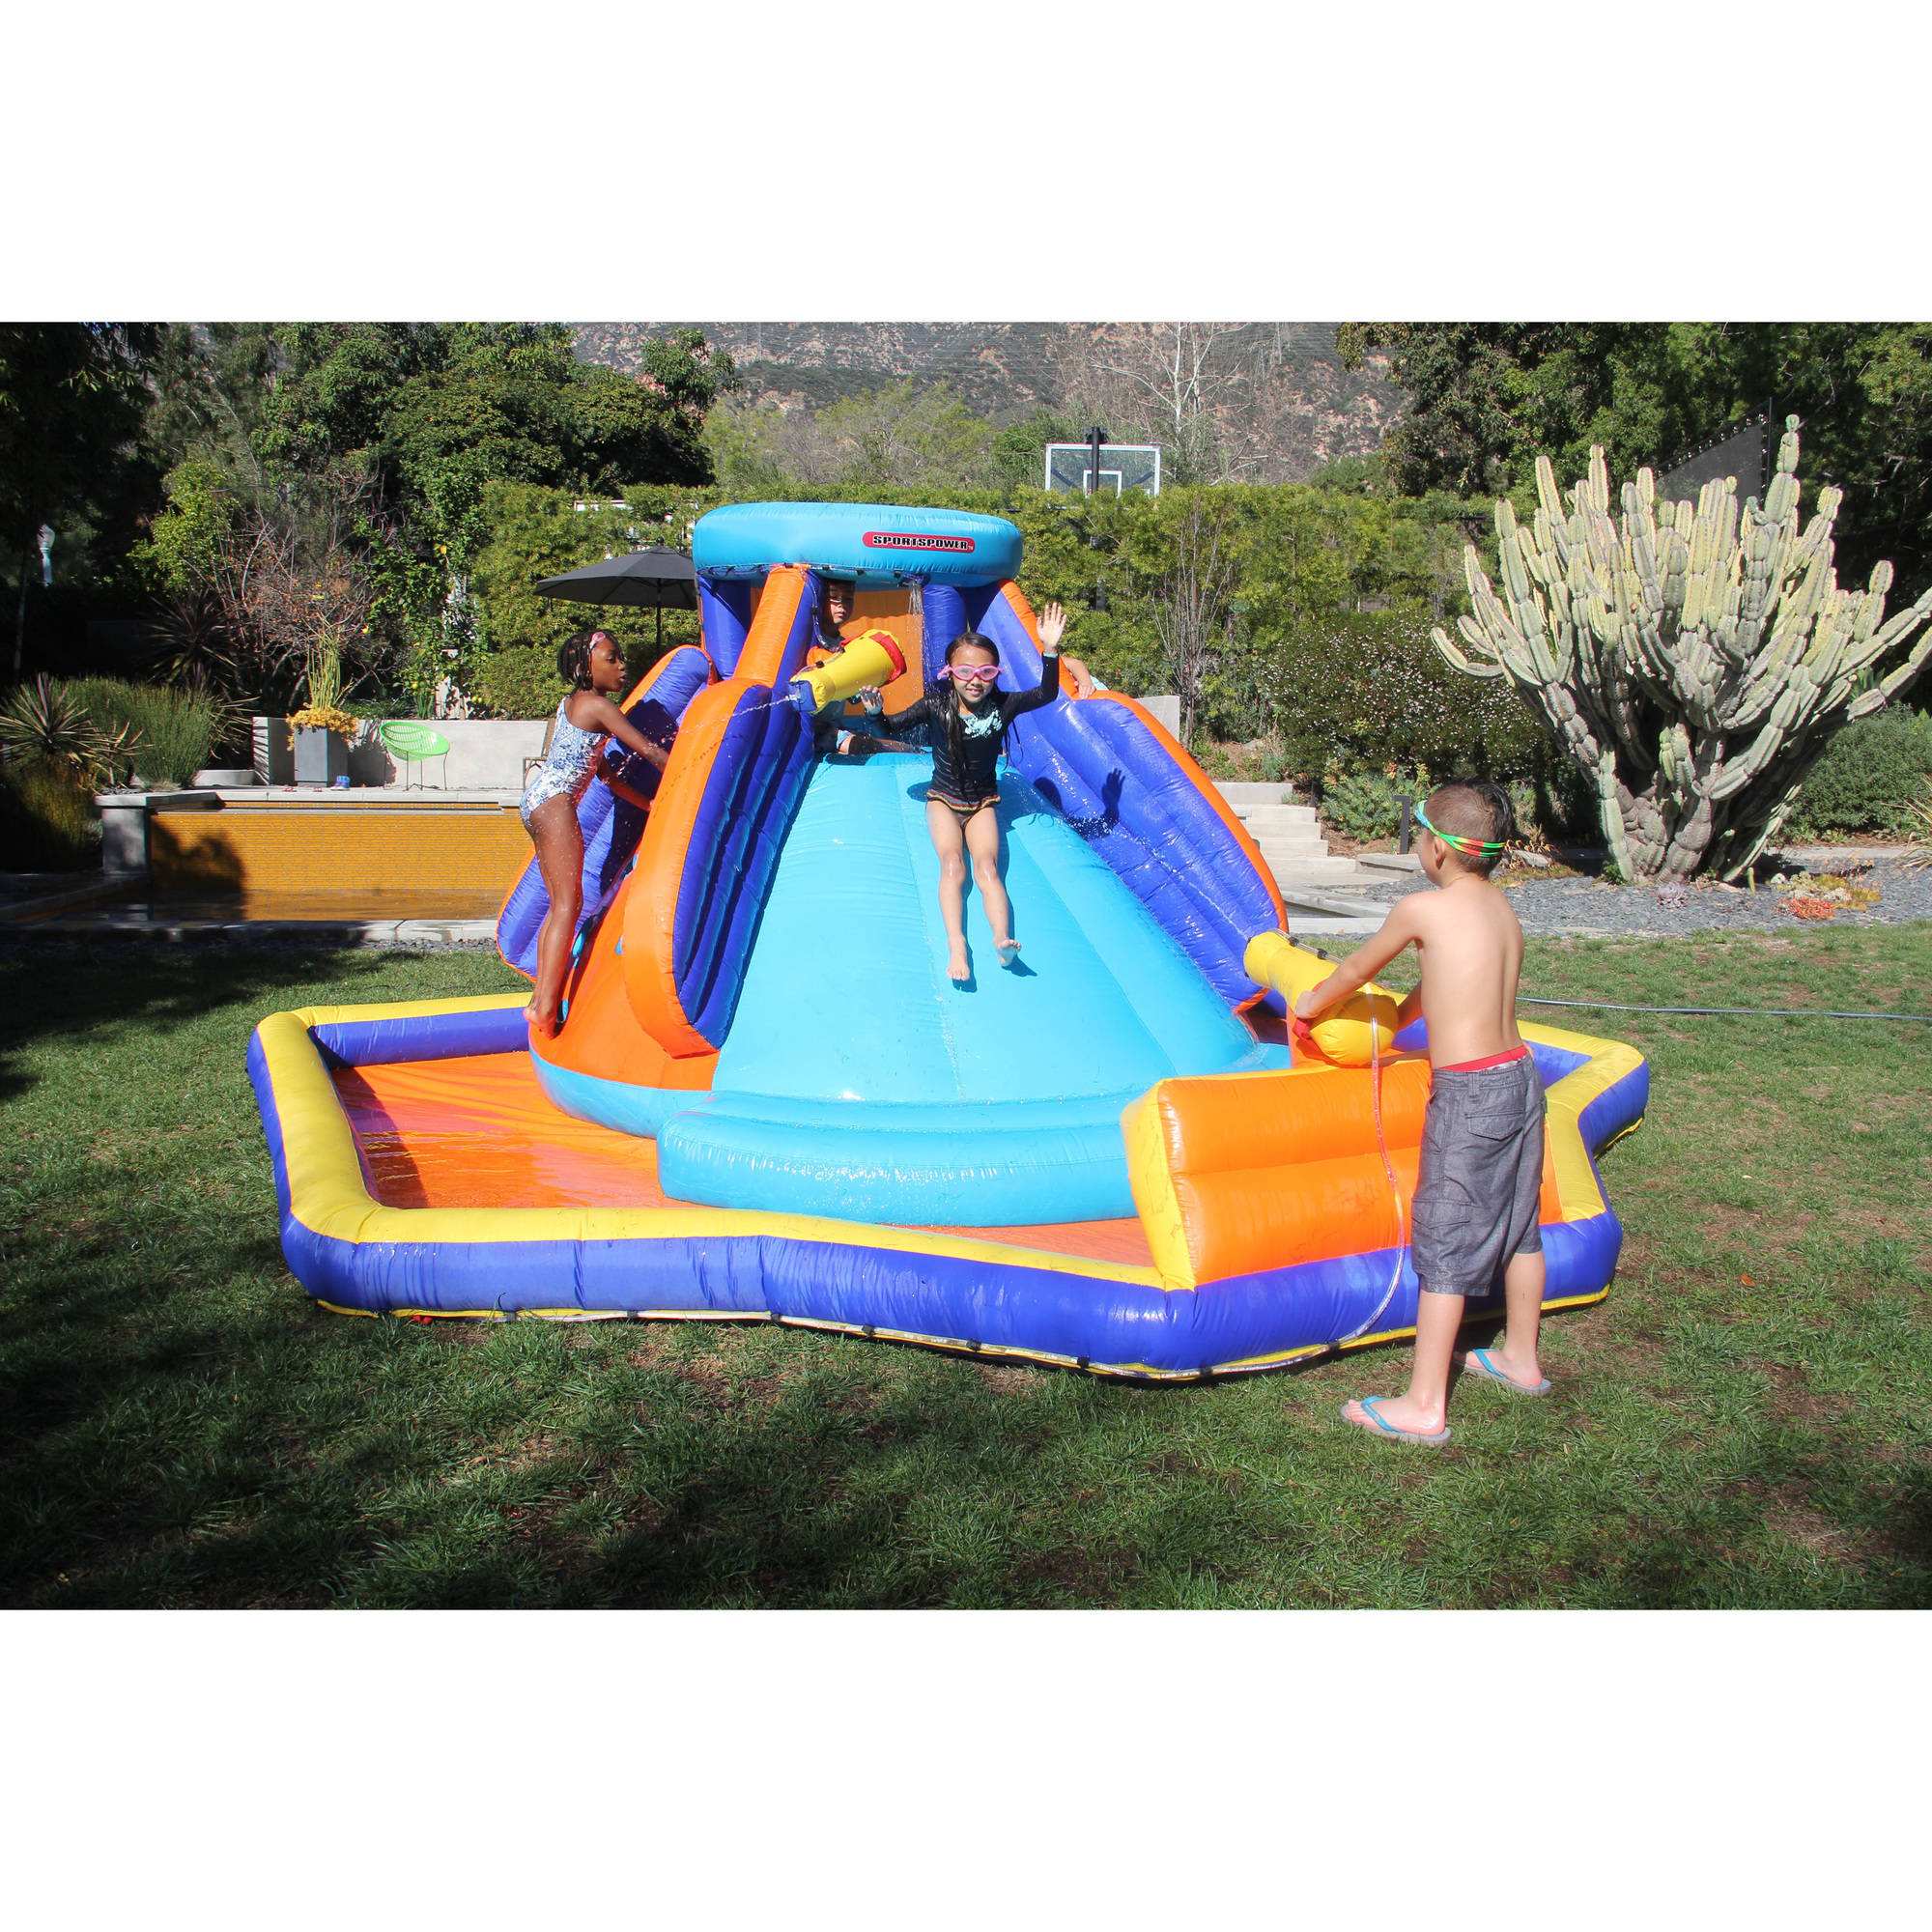 Inflatable Water Slide Repair Kit: Inflatable Sportspower Battle Ridge Water Slide Outdoor